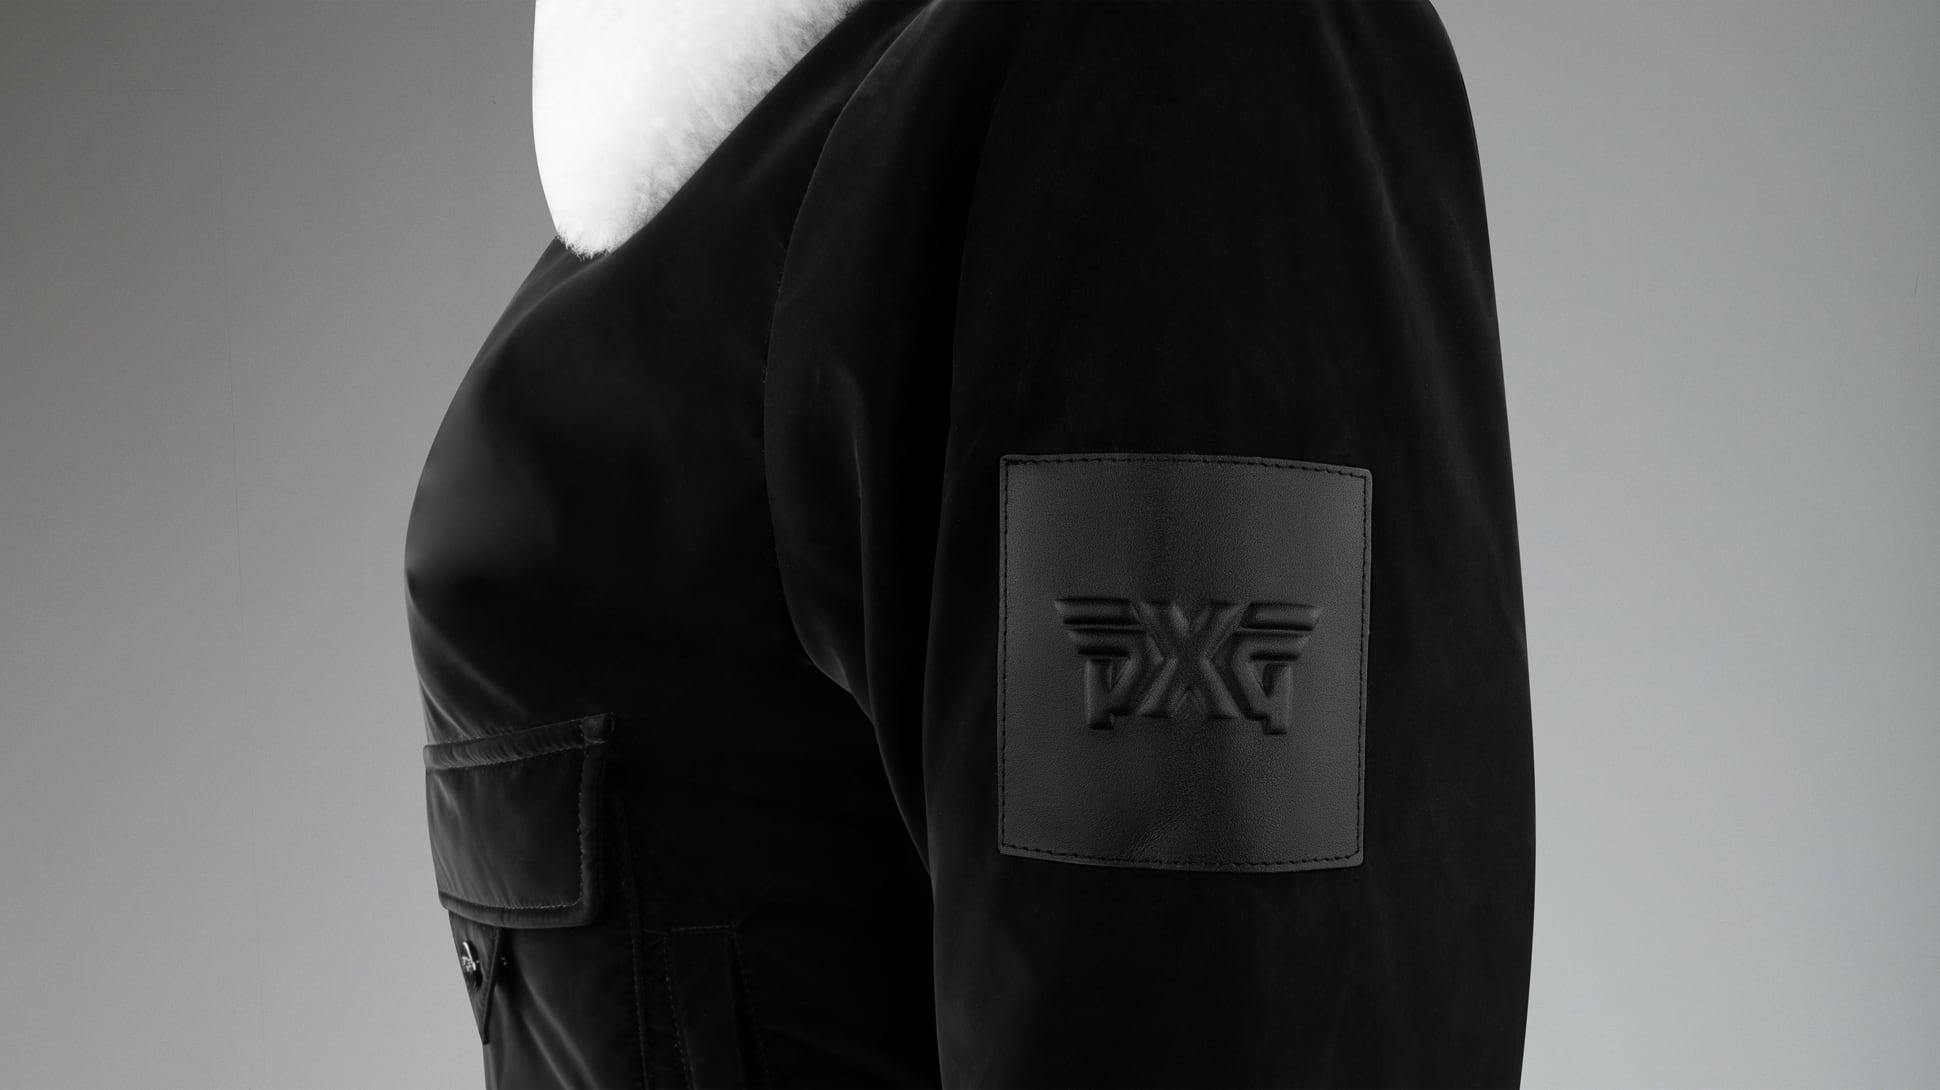 Winter-Ready Wool Bomber Jacket Image 4